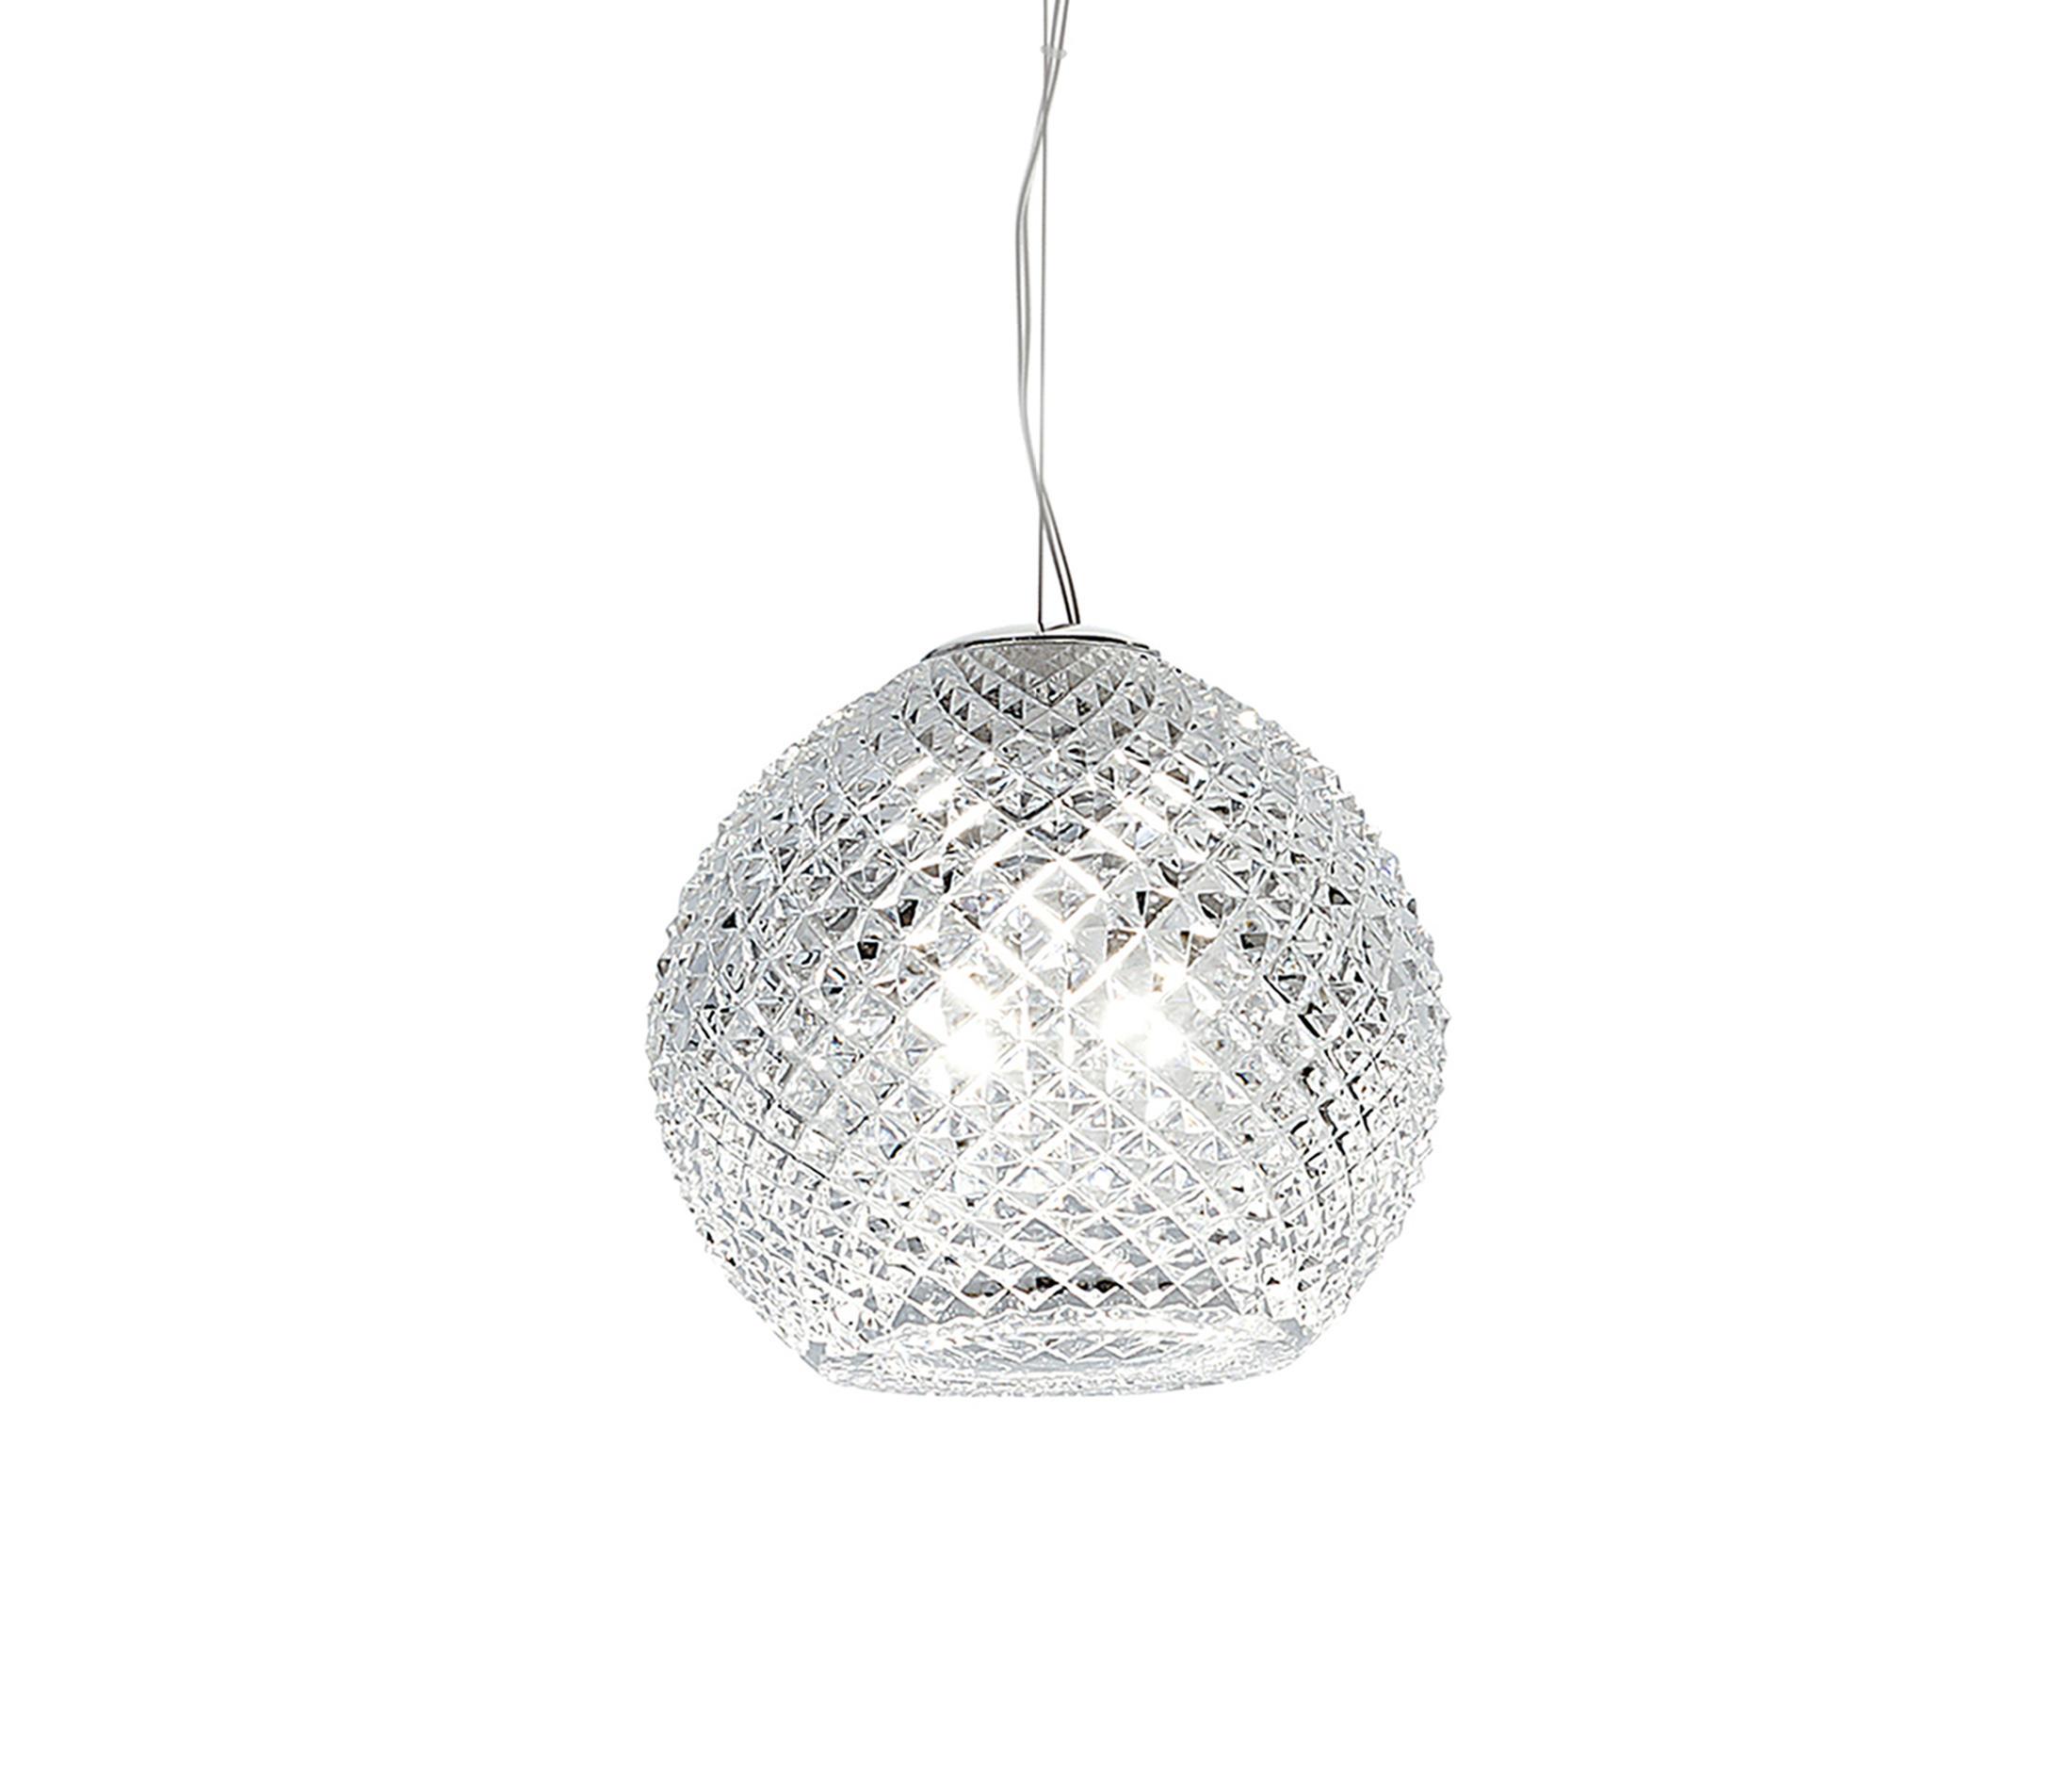 DIAMOND-SWIRL D82 A01 00 - General lighting from Fabbian | Architonic